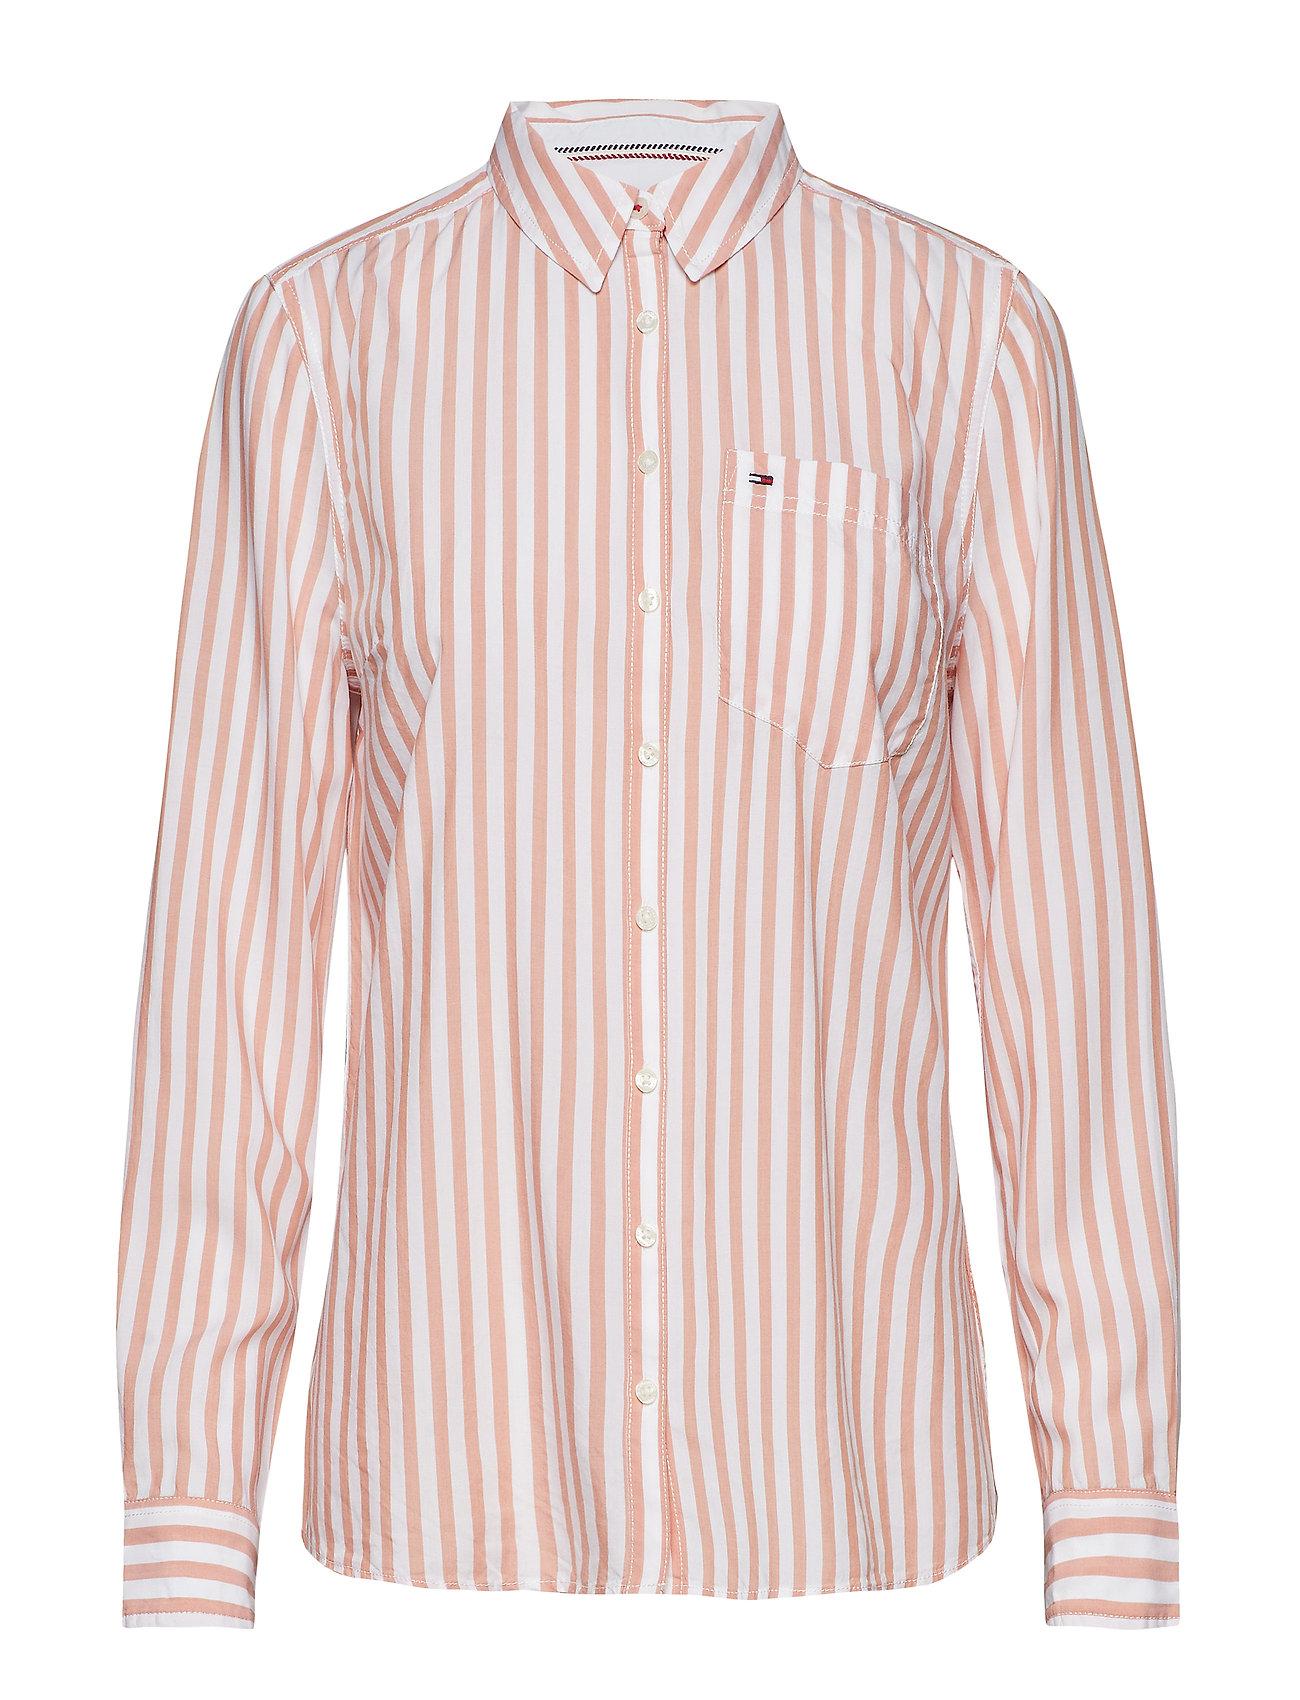 WhiteTommy Regular Stripe Jeans BakedClassic Tjw Shirtsun cJTlFK1